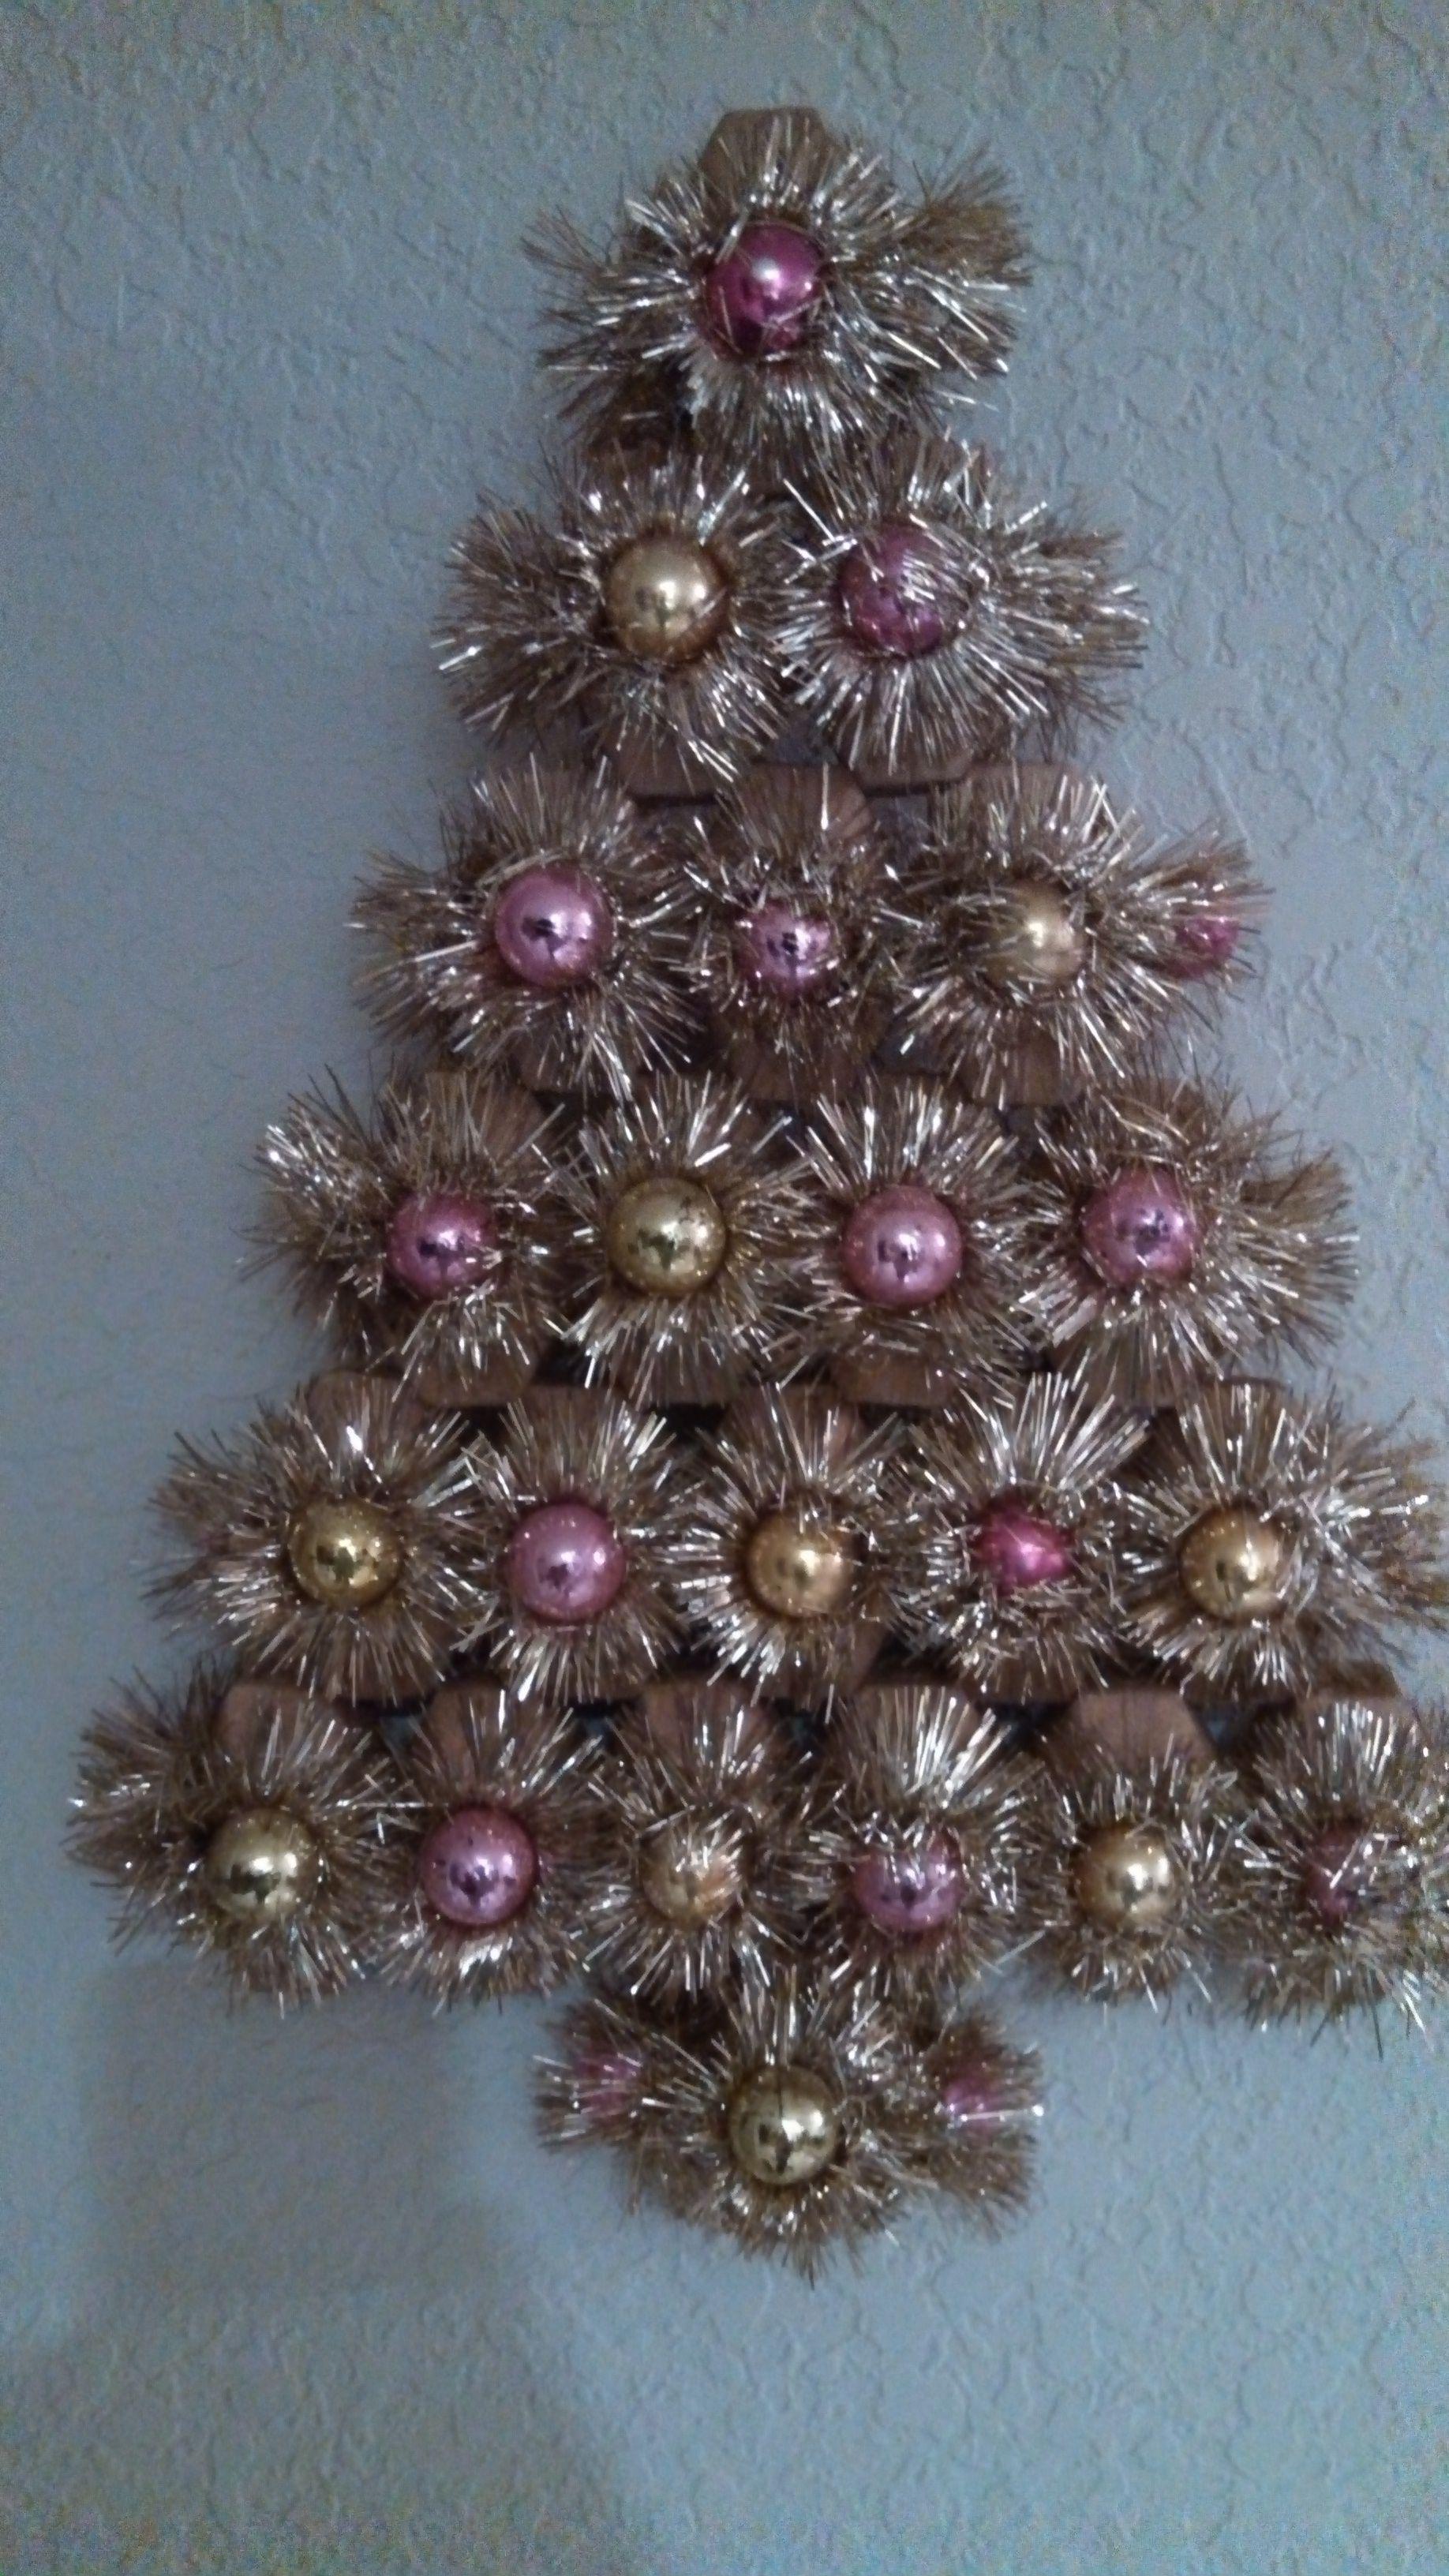 35 Tinsel Wall Christmas Tree Ideas For Your Home Decor Wall Christmas Tree Aluminum Christmas Tree Christmas Tinsel